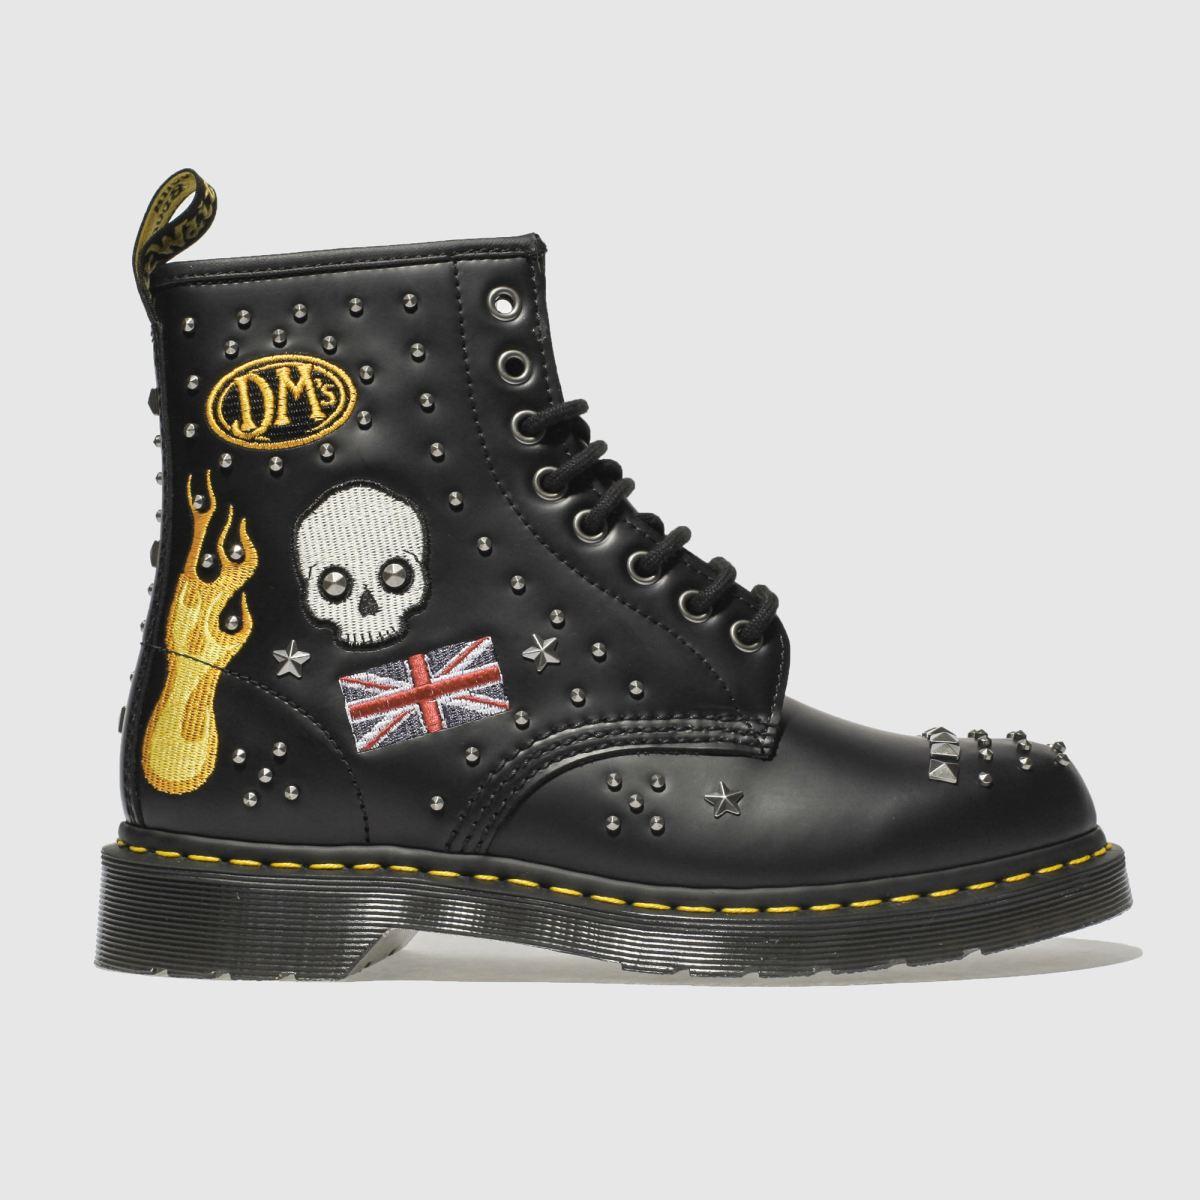 Dr Martens Black 1460 Rockabilly Boots